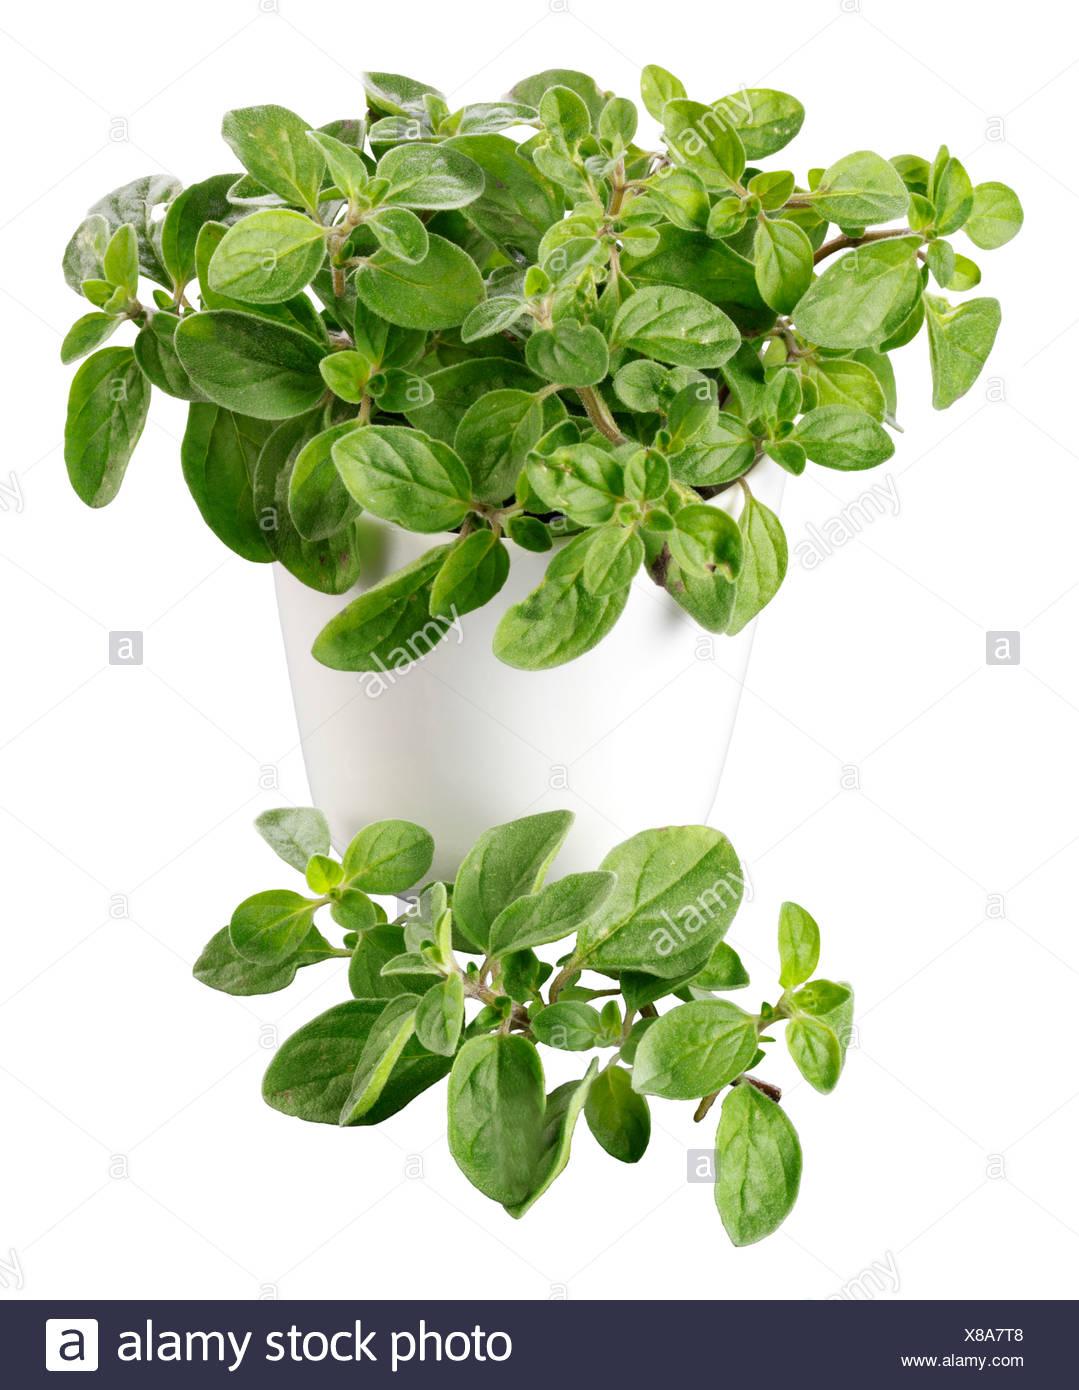 OREGANO PLANT - Stock Image